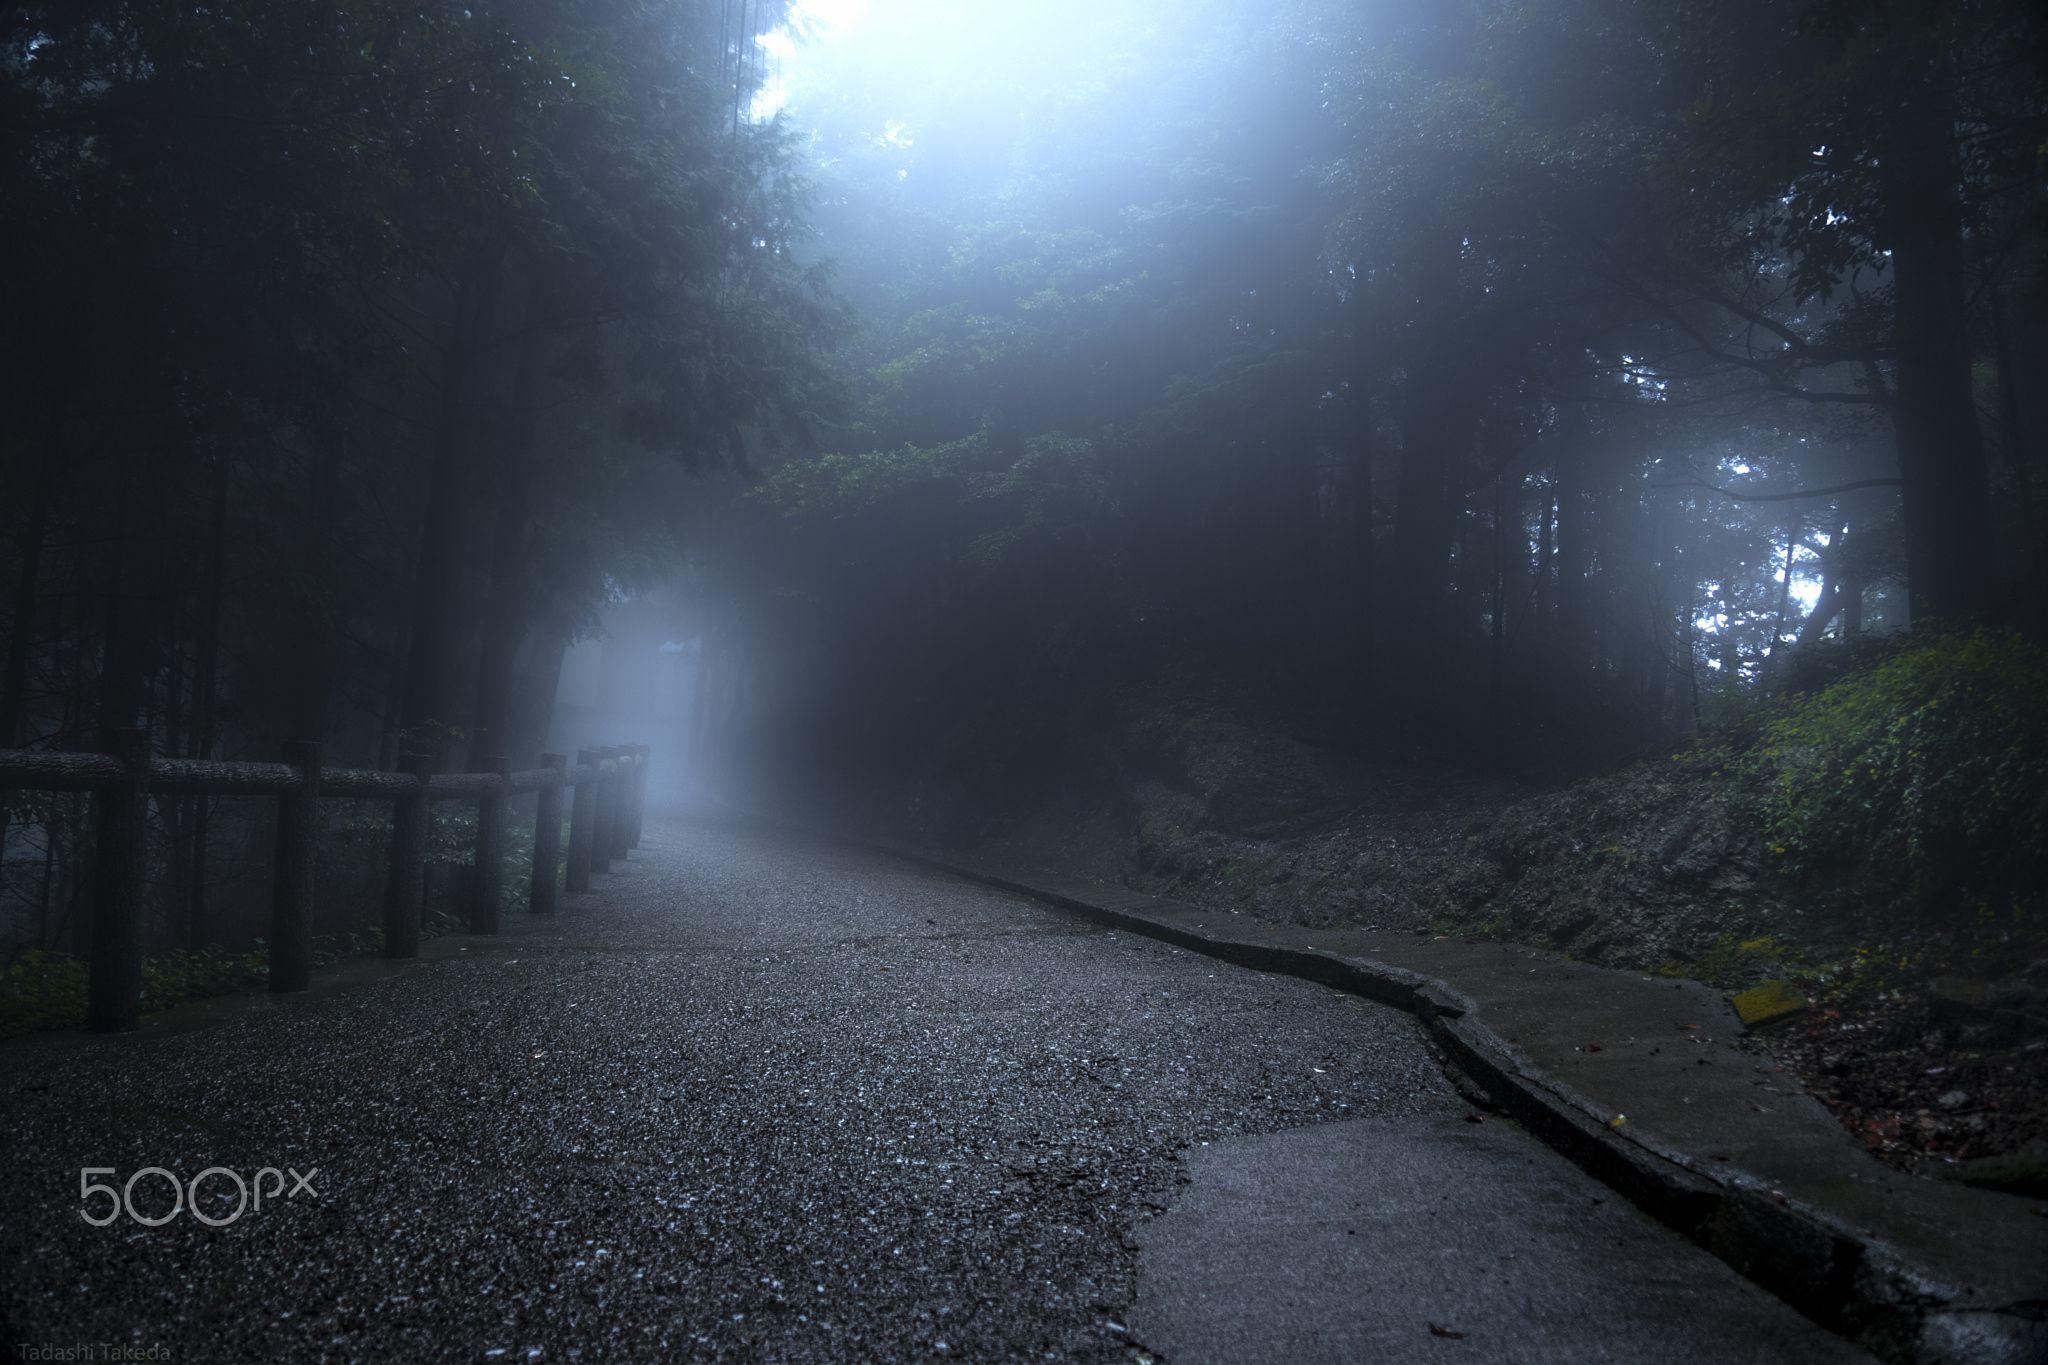 To the Temple of the mist - To the Temple of the mist